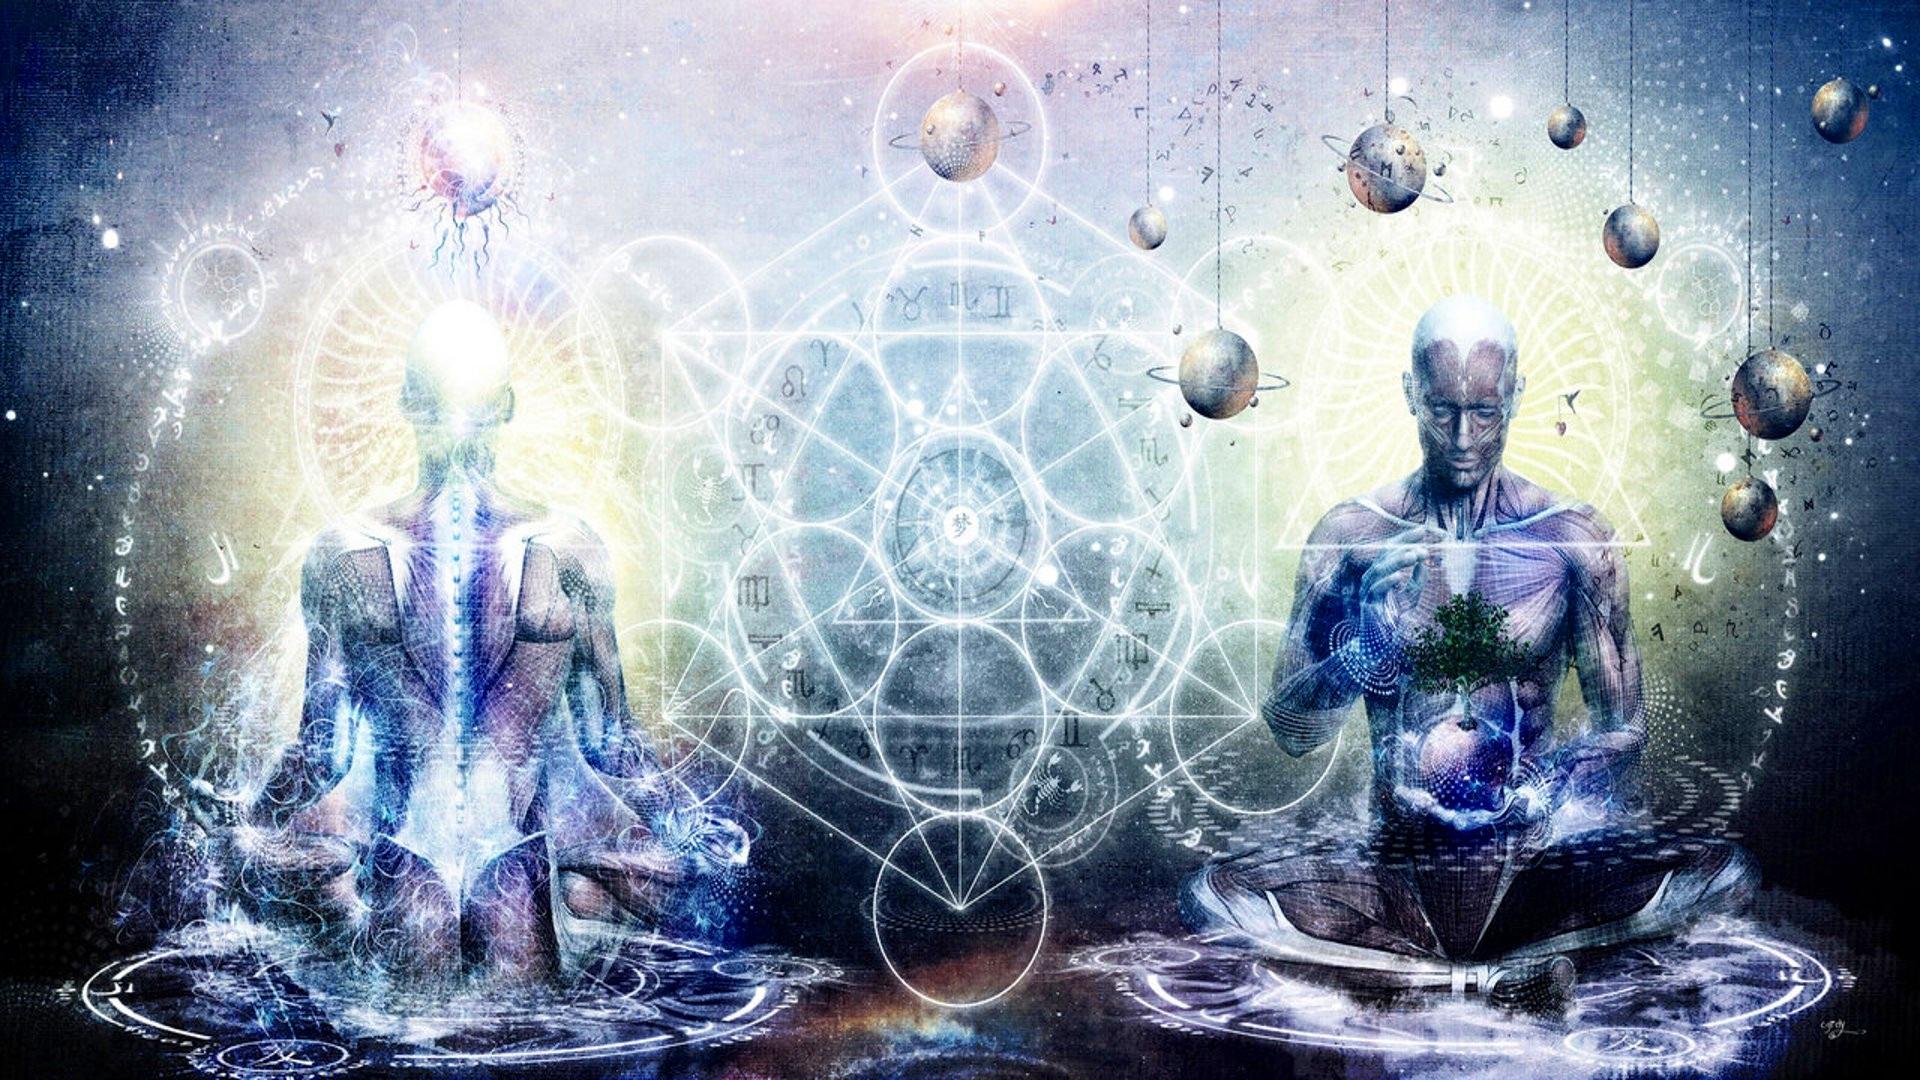 Awakening Part 2: Clarity and Bliss